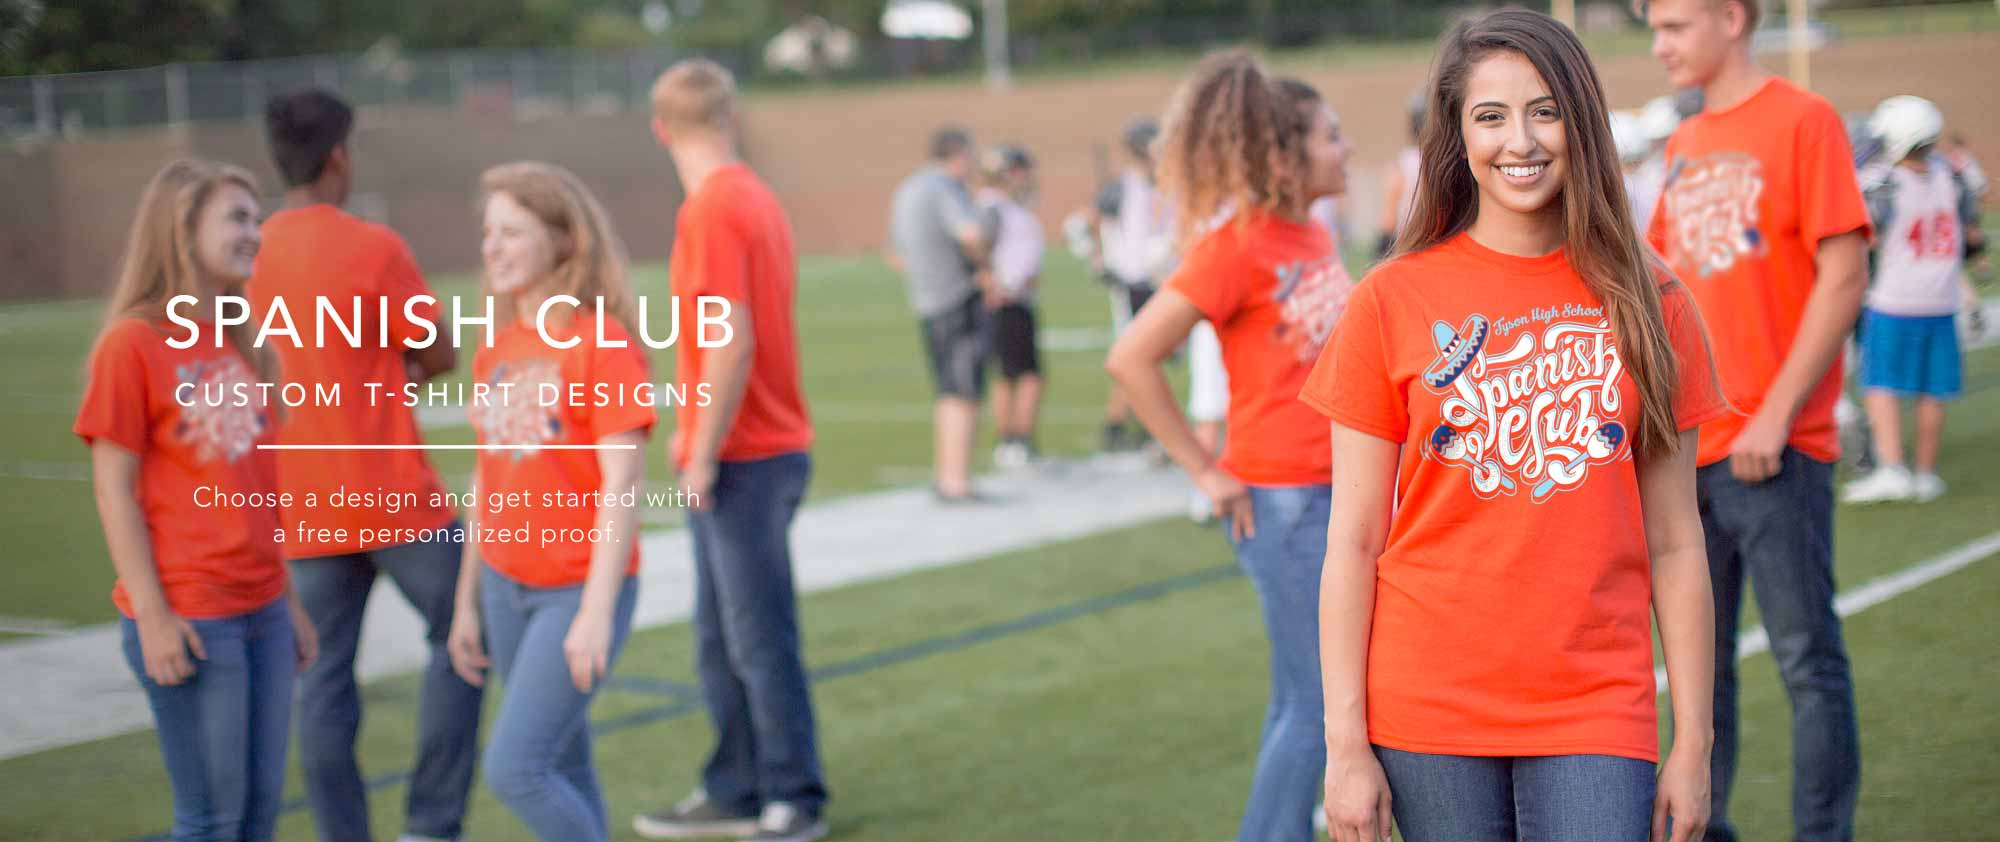 ca8976cc Image Market: Student Council T Shirts, Senior Custom T-Shirts, High School  Club TShirts - Choose a Design to Create Custom T-shirts for Any High  School ...